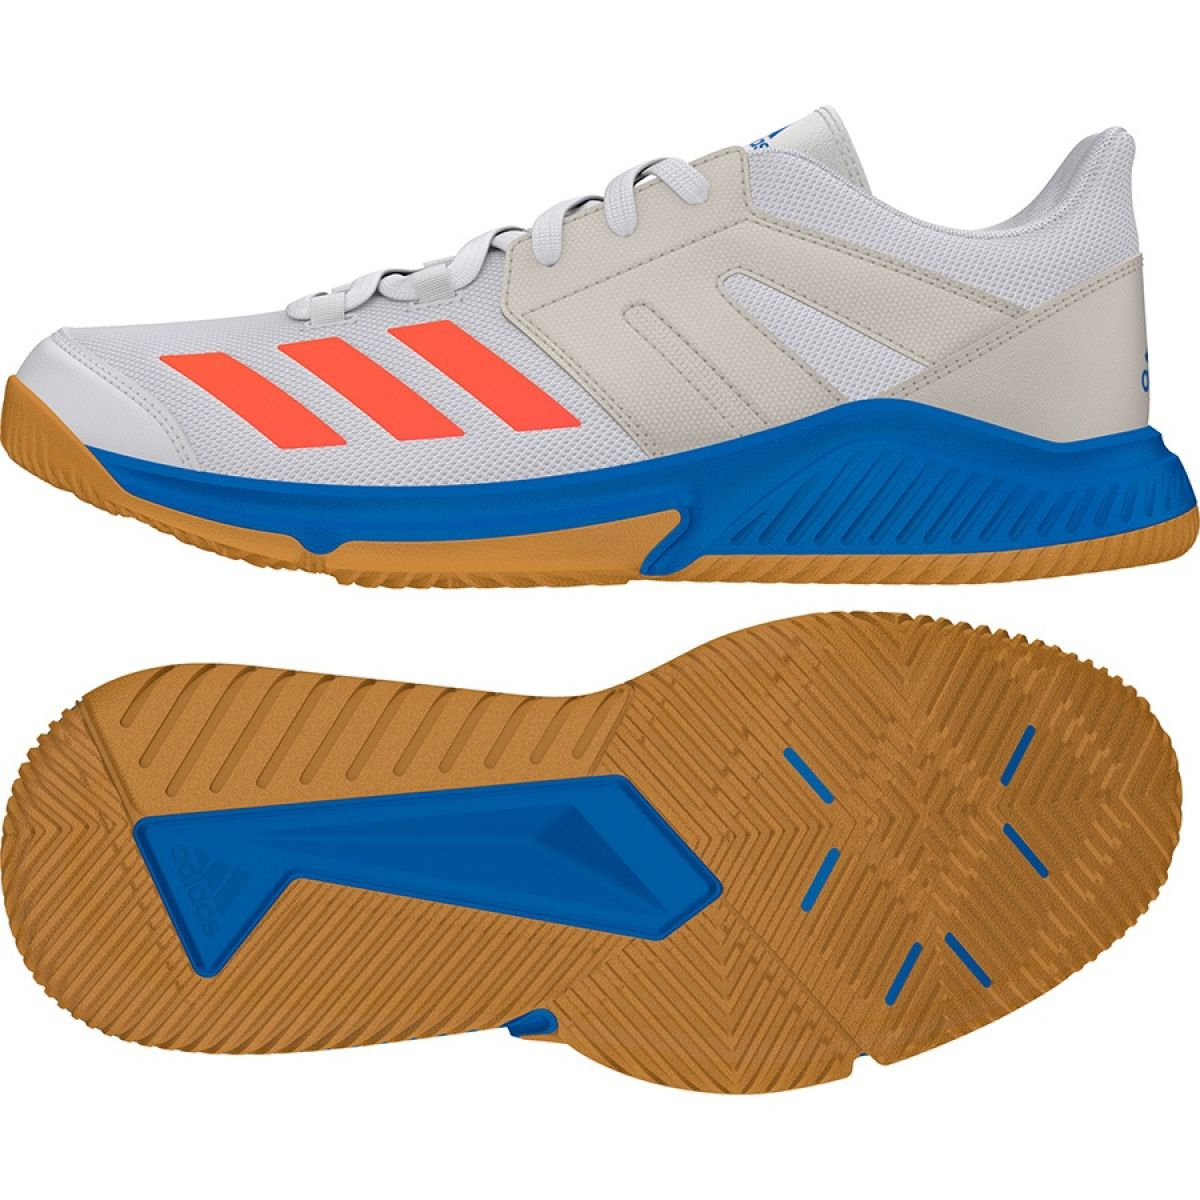 Essence Adidas Chaussures B22589 De M Handball If6gY7byv